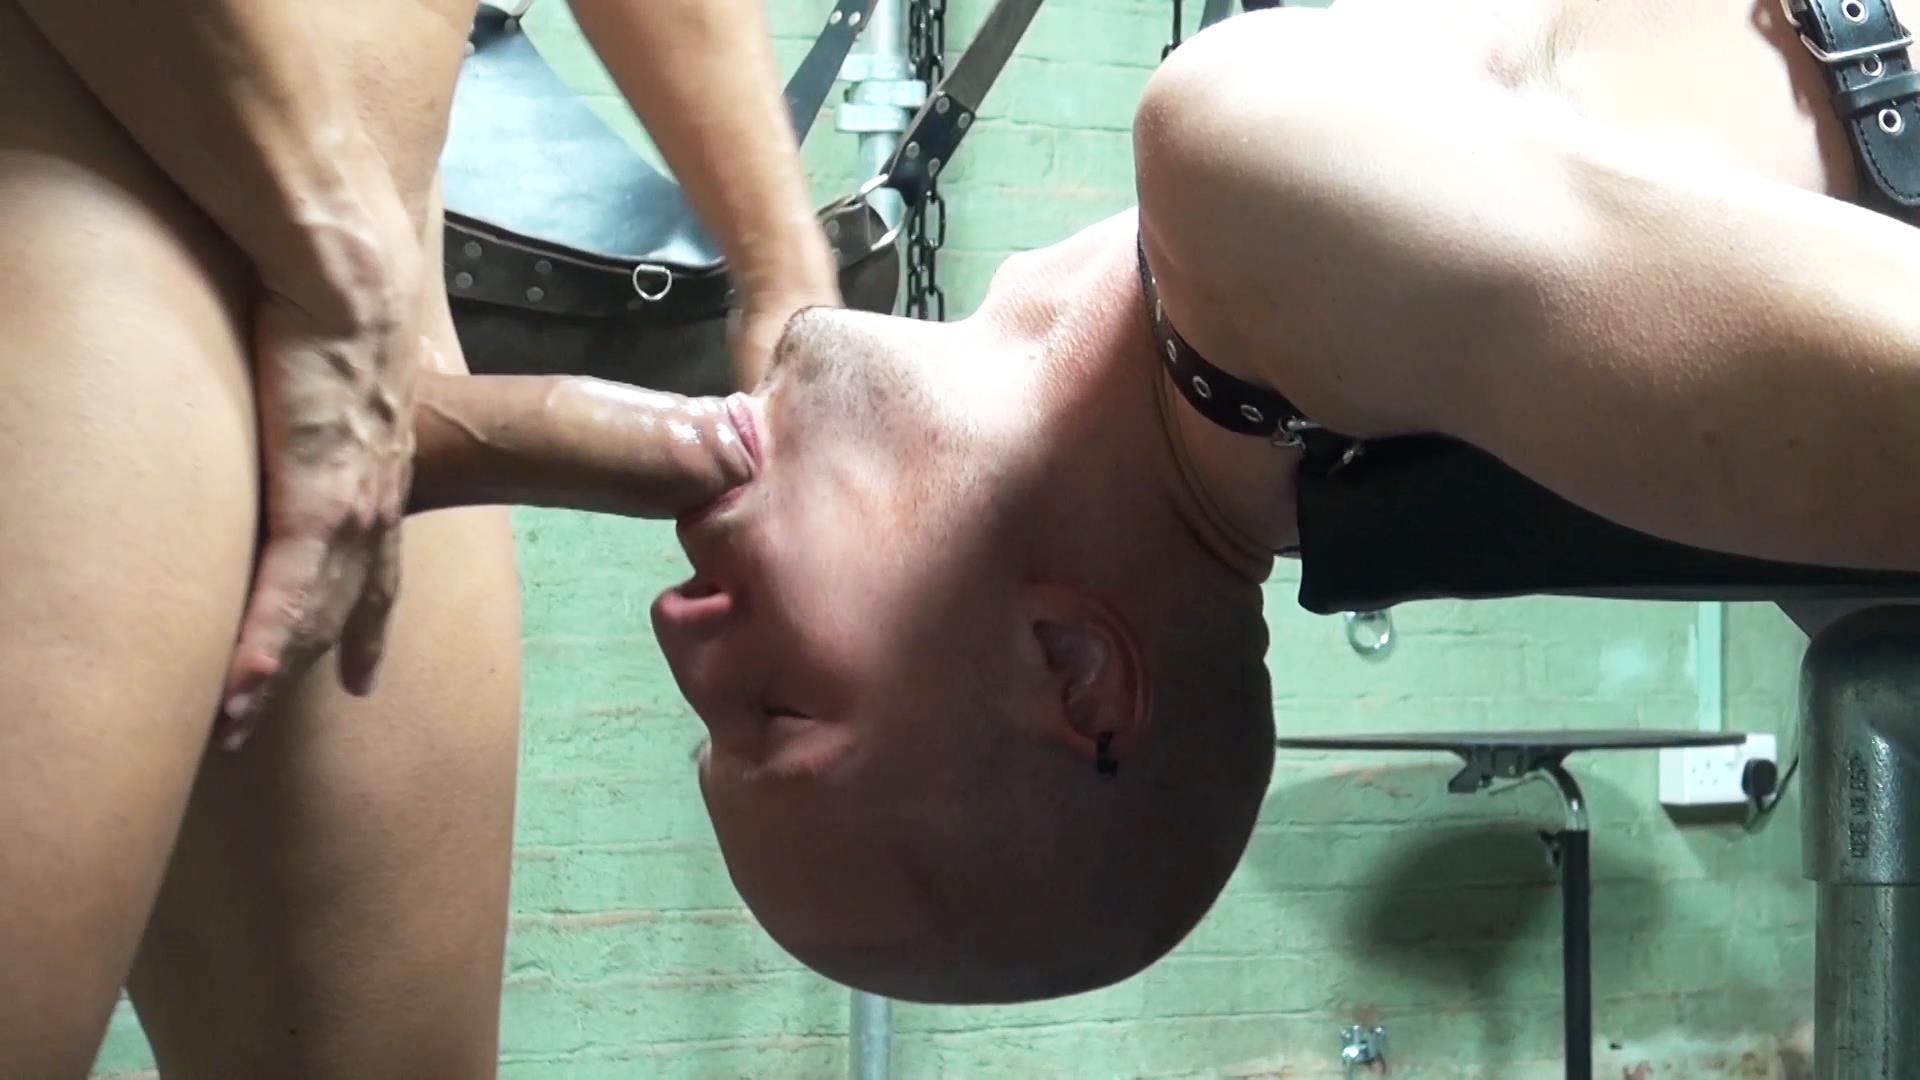 Dark-Alley-XT-Anakonda-and-Jason-Domino-Bareback-Big-Uncut-Cock-Amateur-Gay-Porn-3 Breeding A Slave Hole With A Big Uncut Cock At The Bathhouse